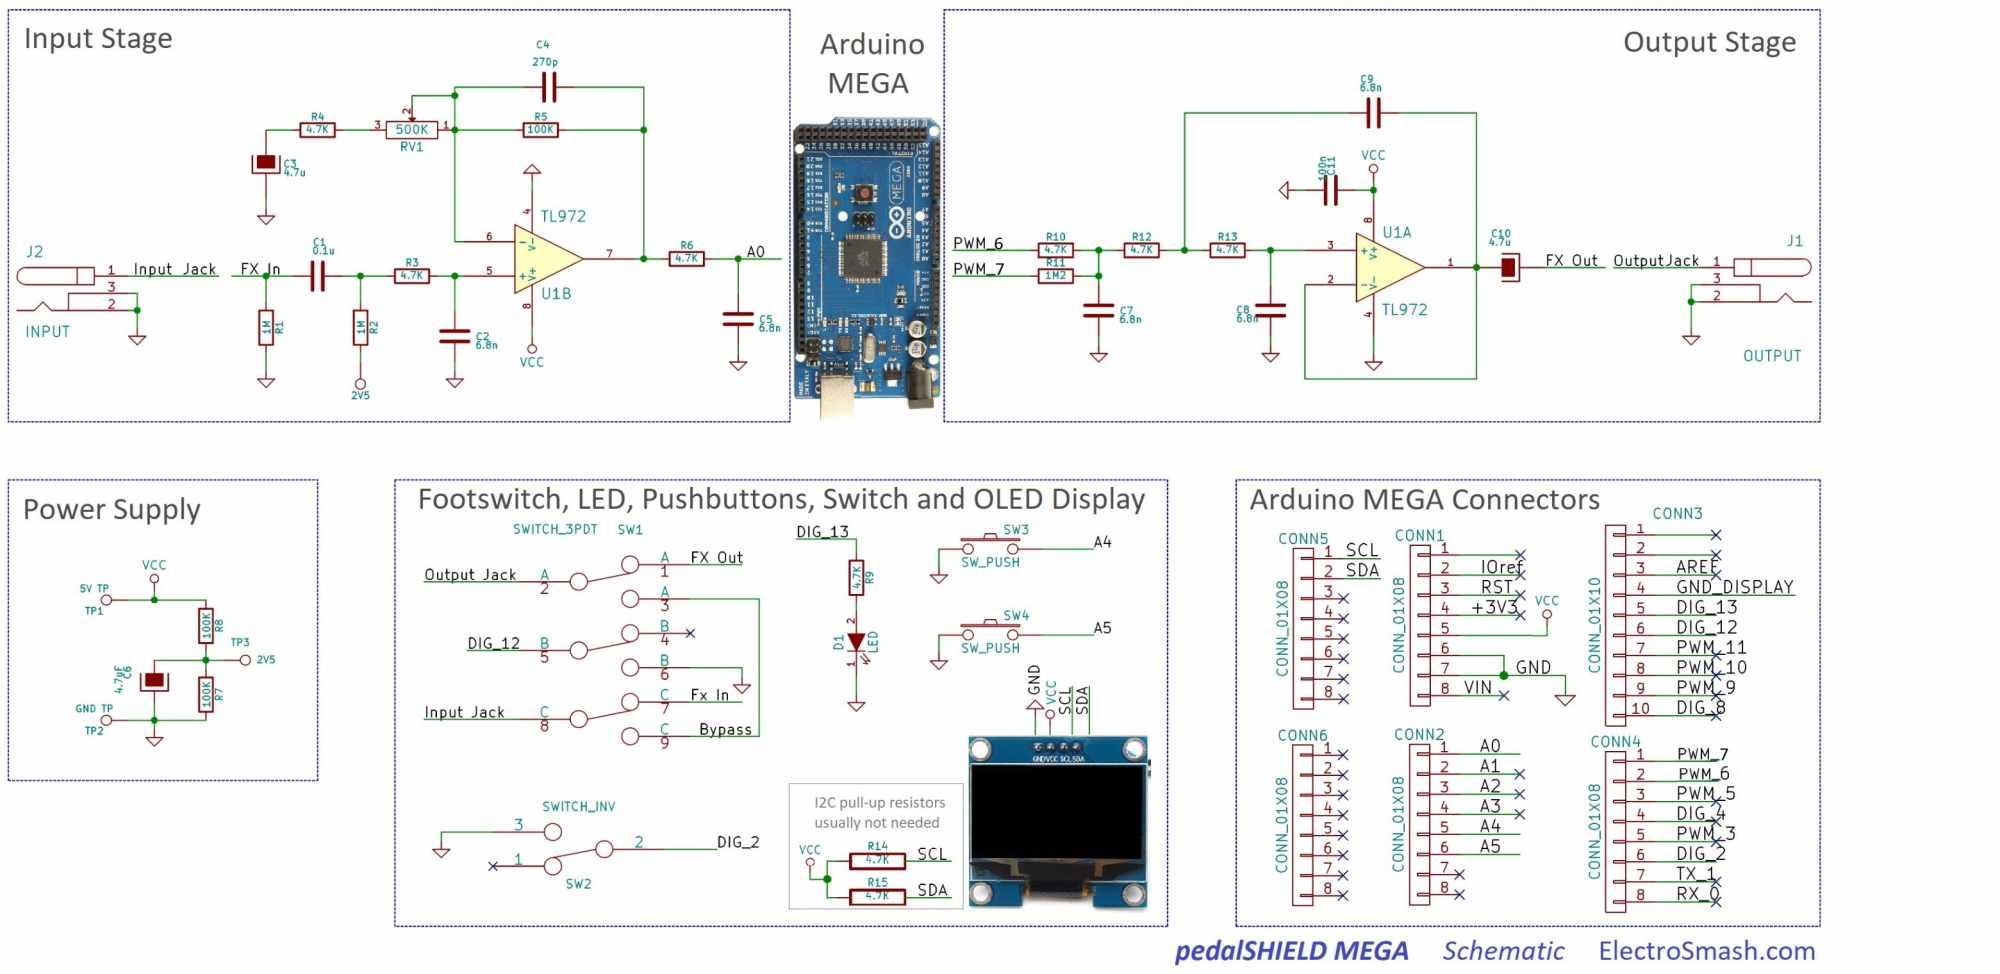 pedalshield-mega-schematic_2018-05-10.jpg